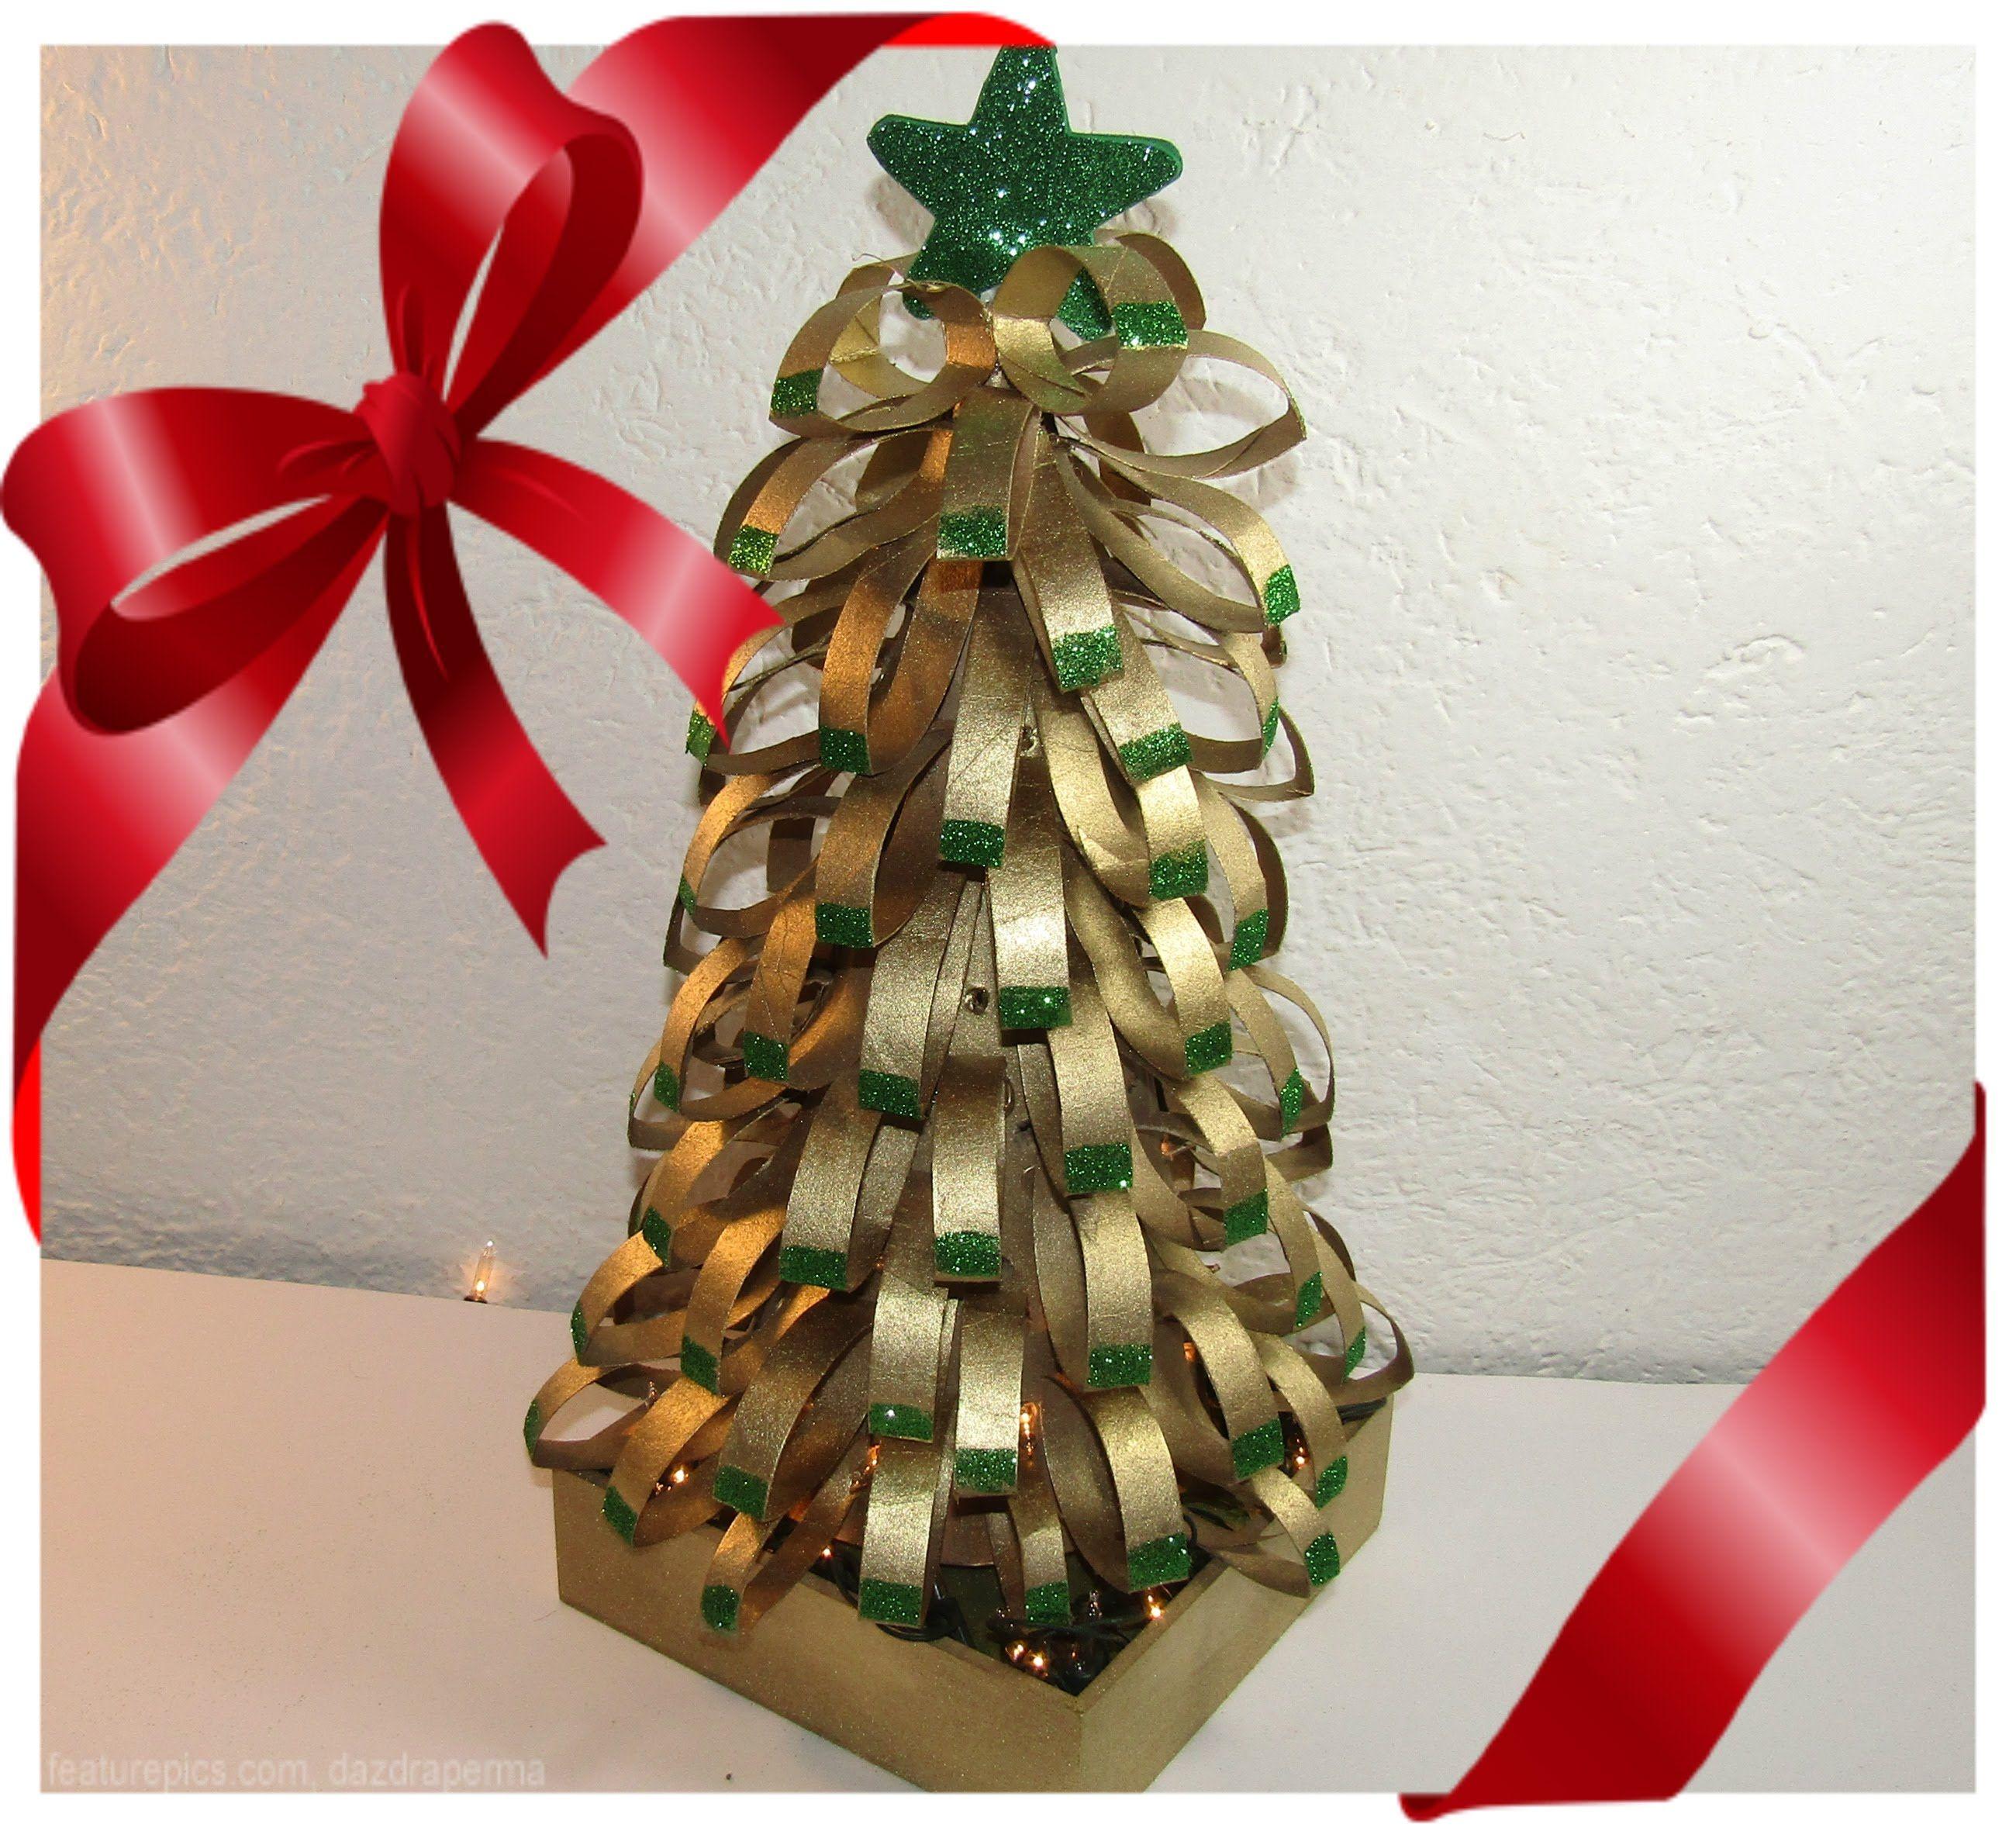 Arbol navide o con tubos de papel higienico adornos de - Adornos navidenos papel ...